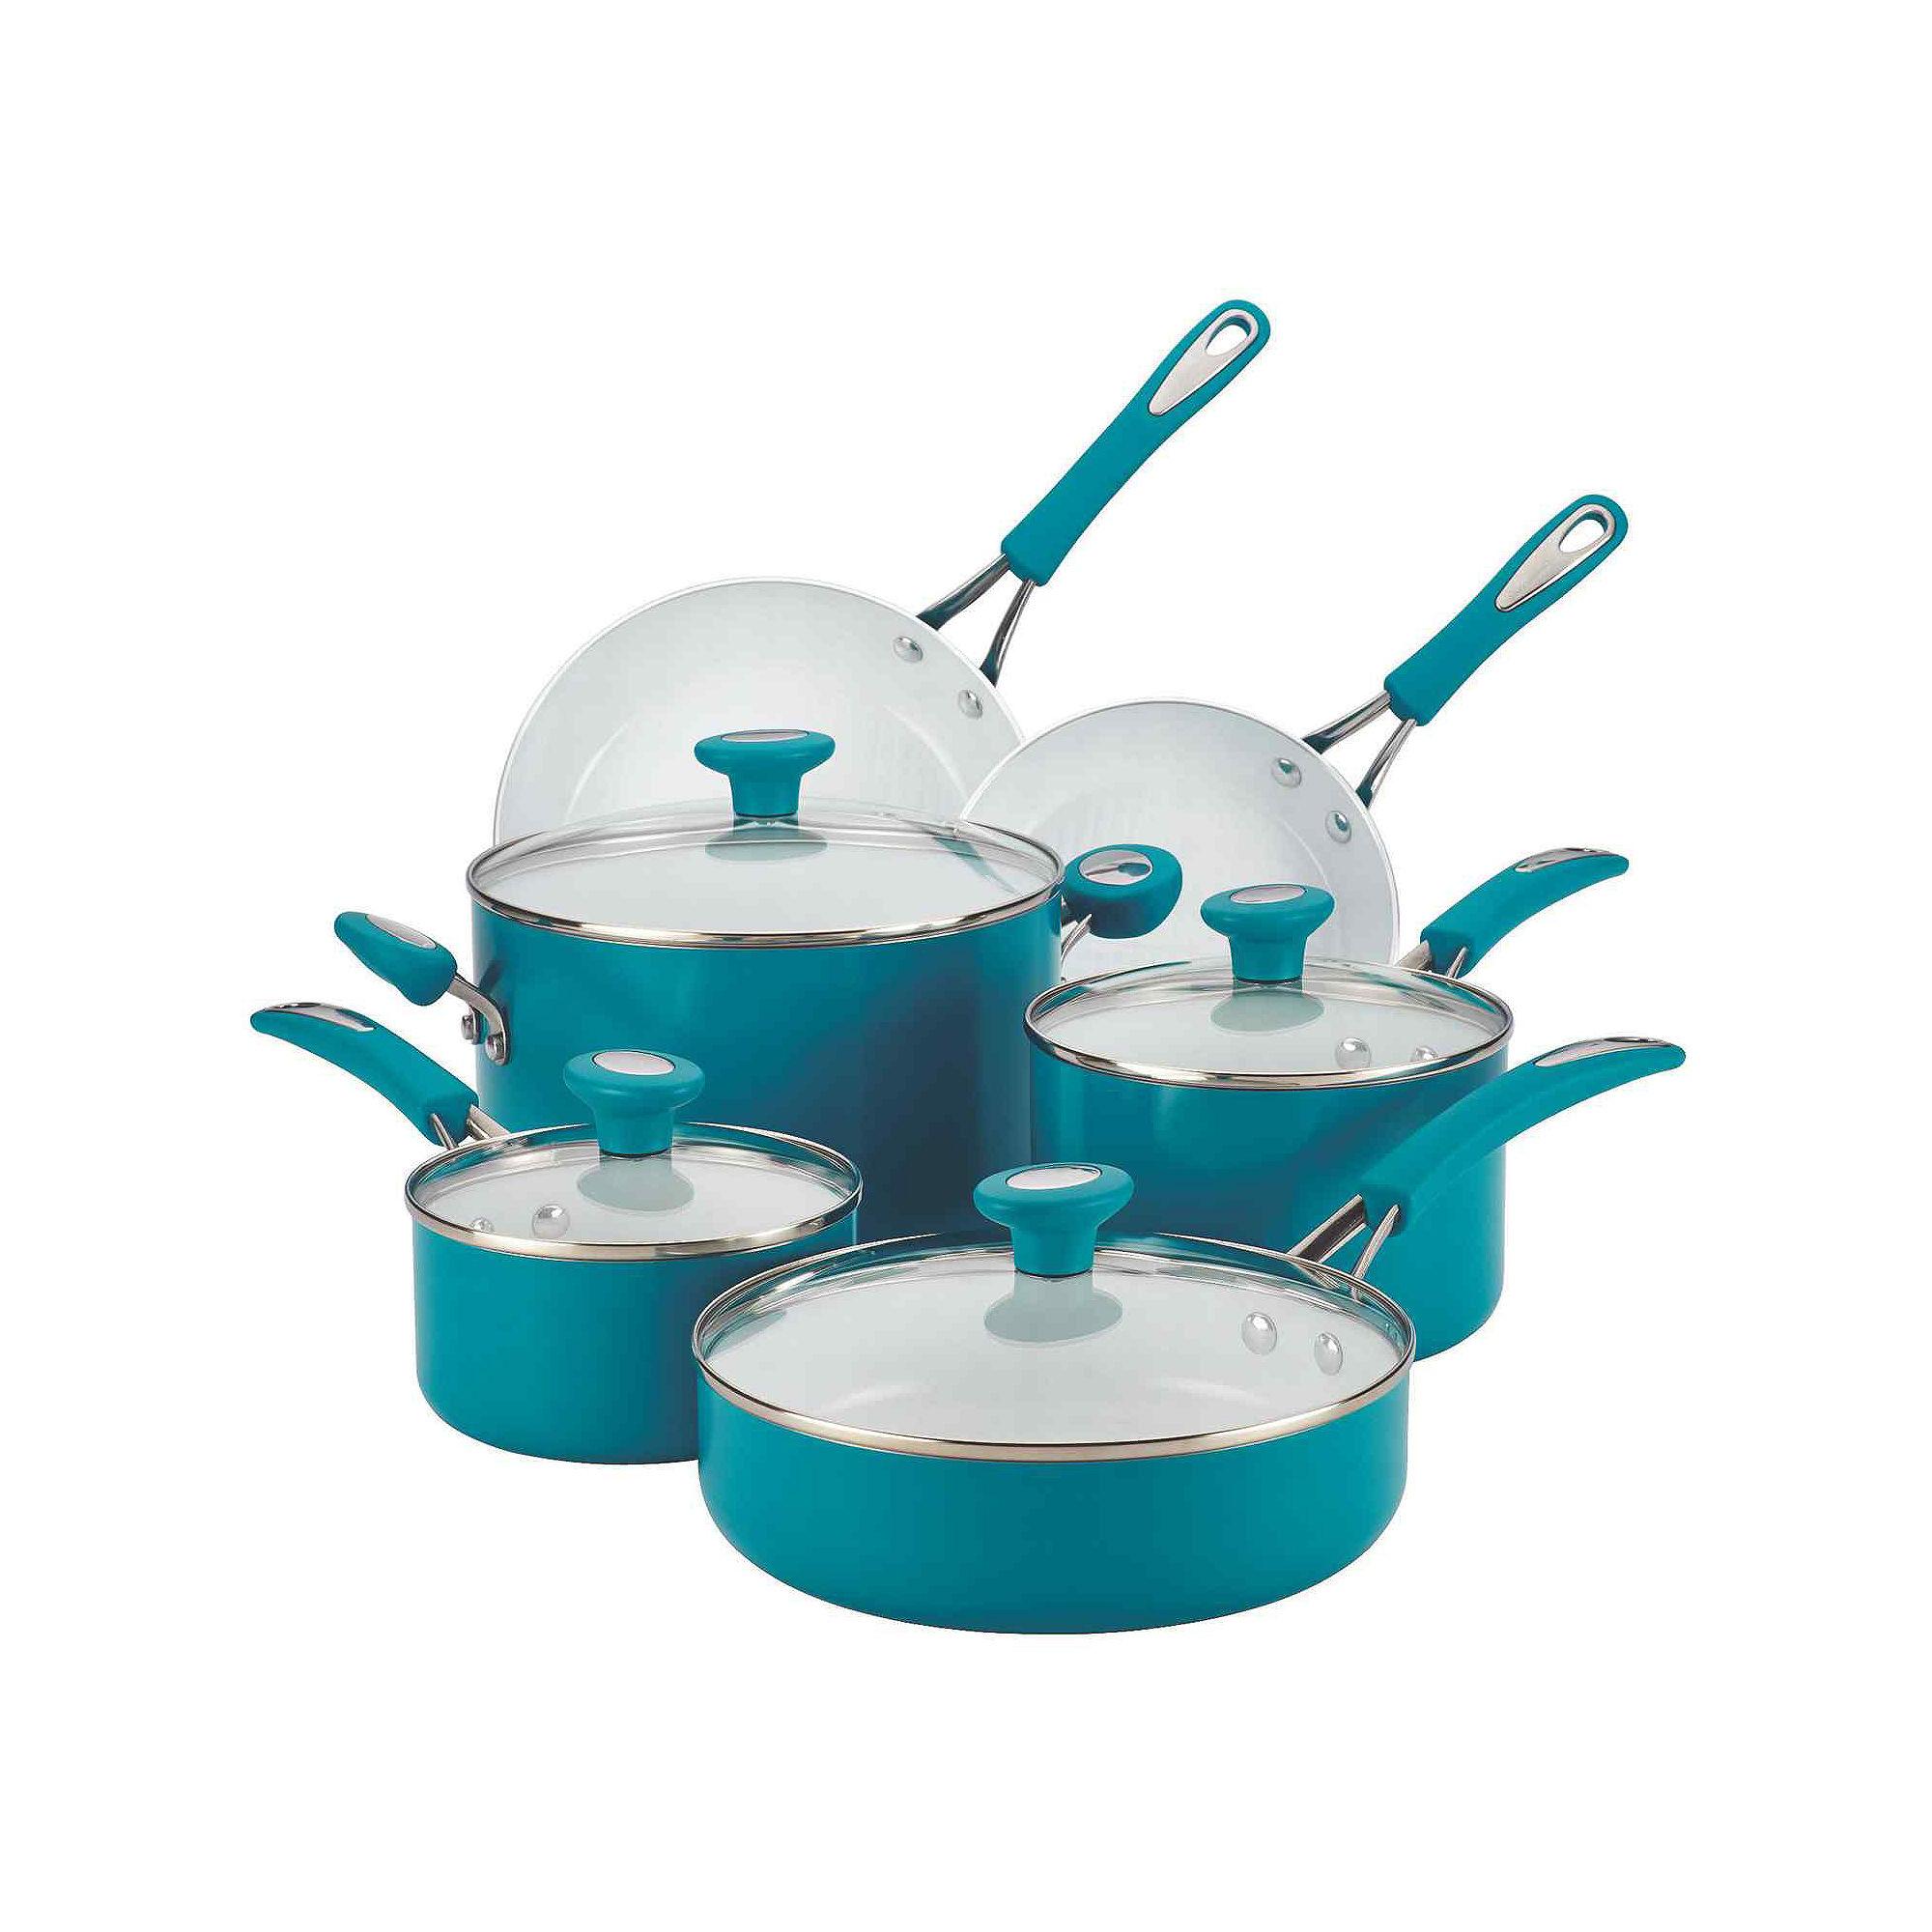 SilverStone Ceramic CXi 12-pc. Nonstick Cookware Set